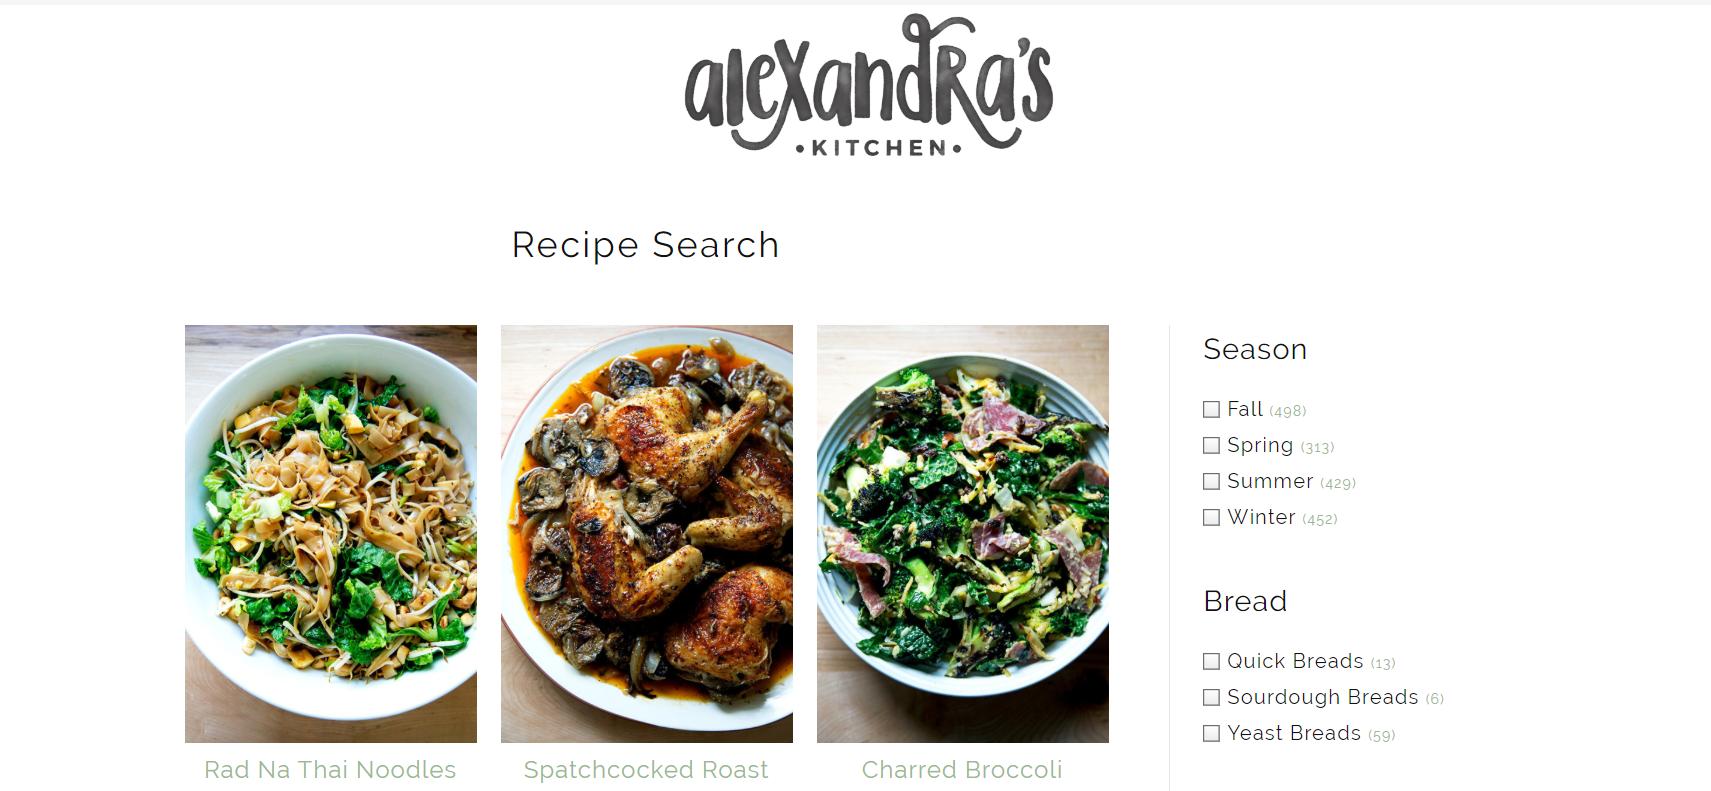 alexandras kitchen